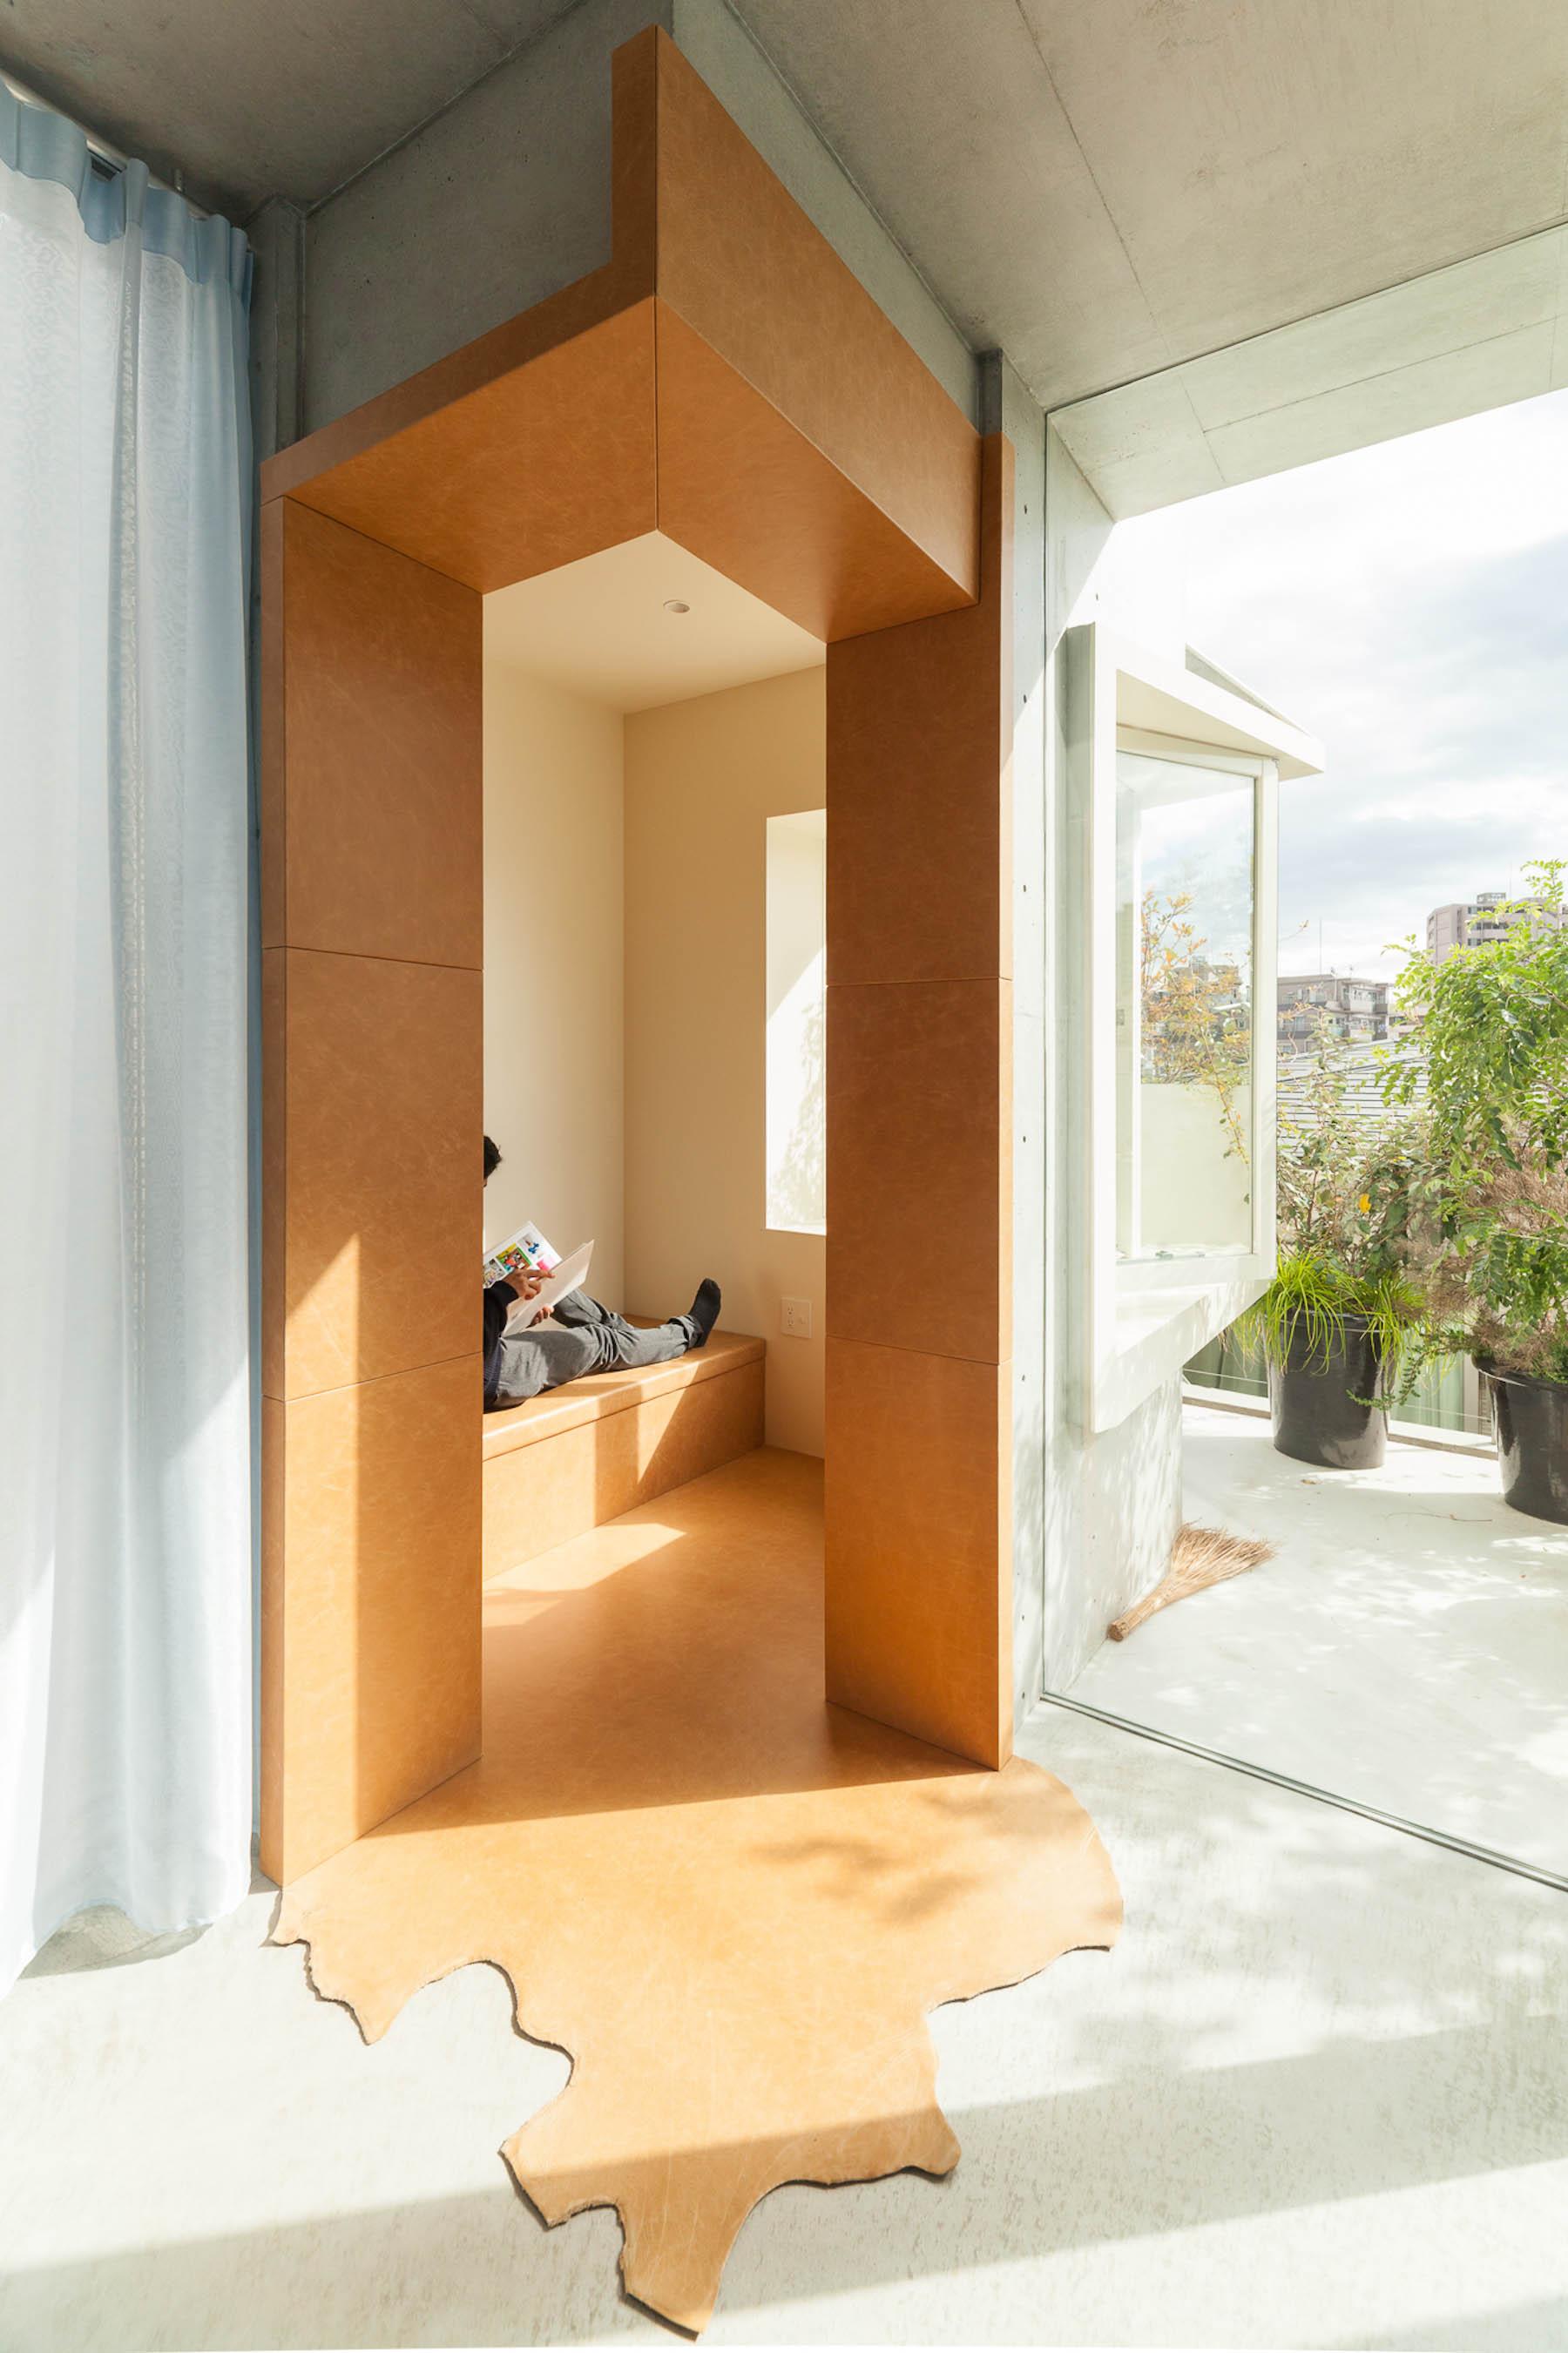 iGNANT-Architecture-Akihisa-Hirata-Tree-Ness-House-13